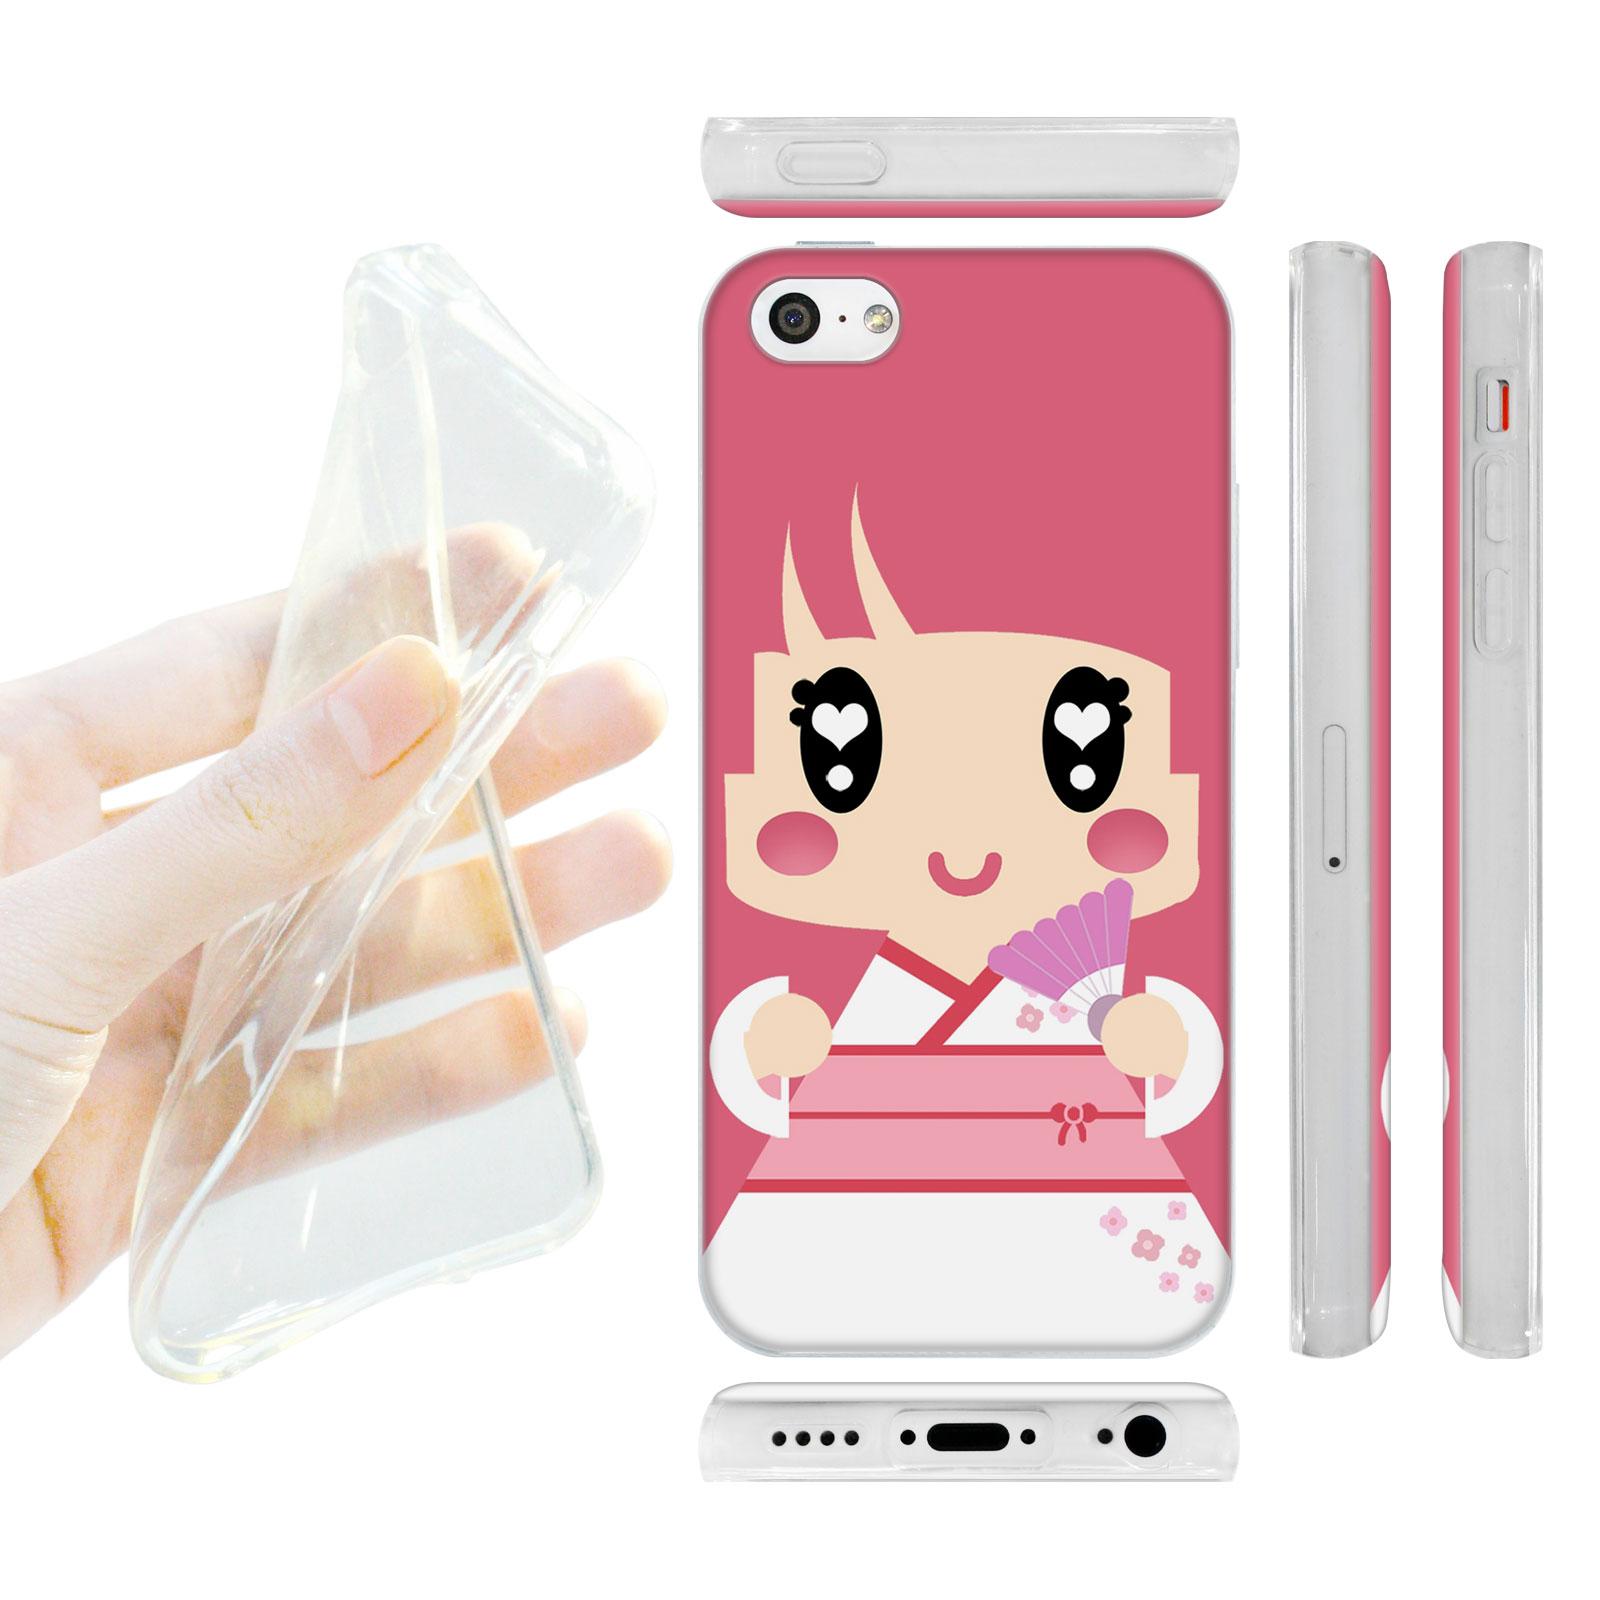 HEAD CASE silikonový obal na mobil Iphone 5C Japonsko holčička kimono  růžová empty d683cf15511